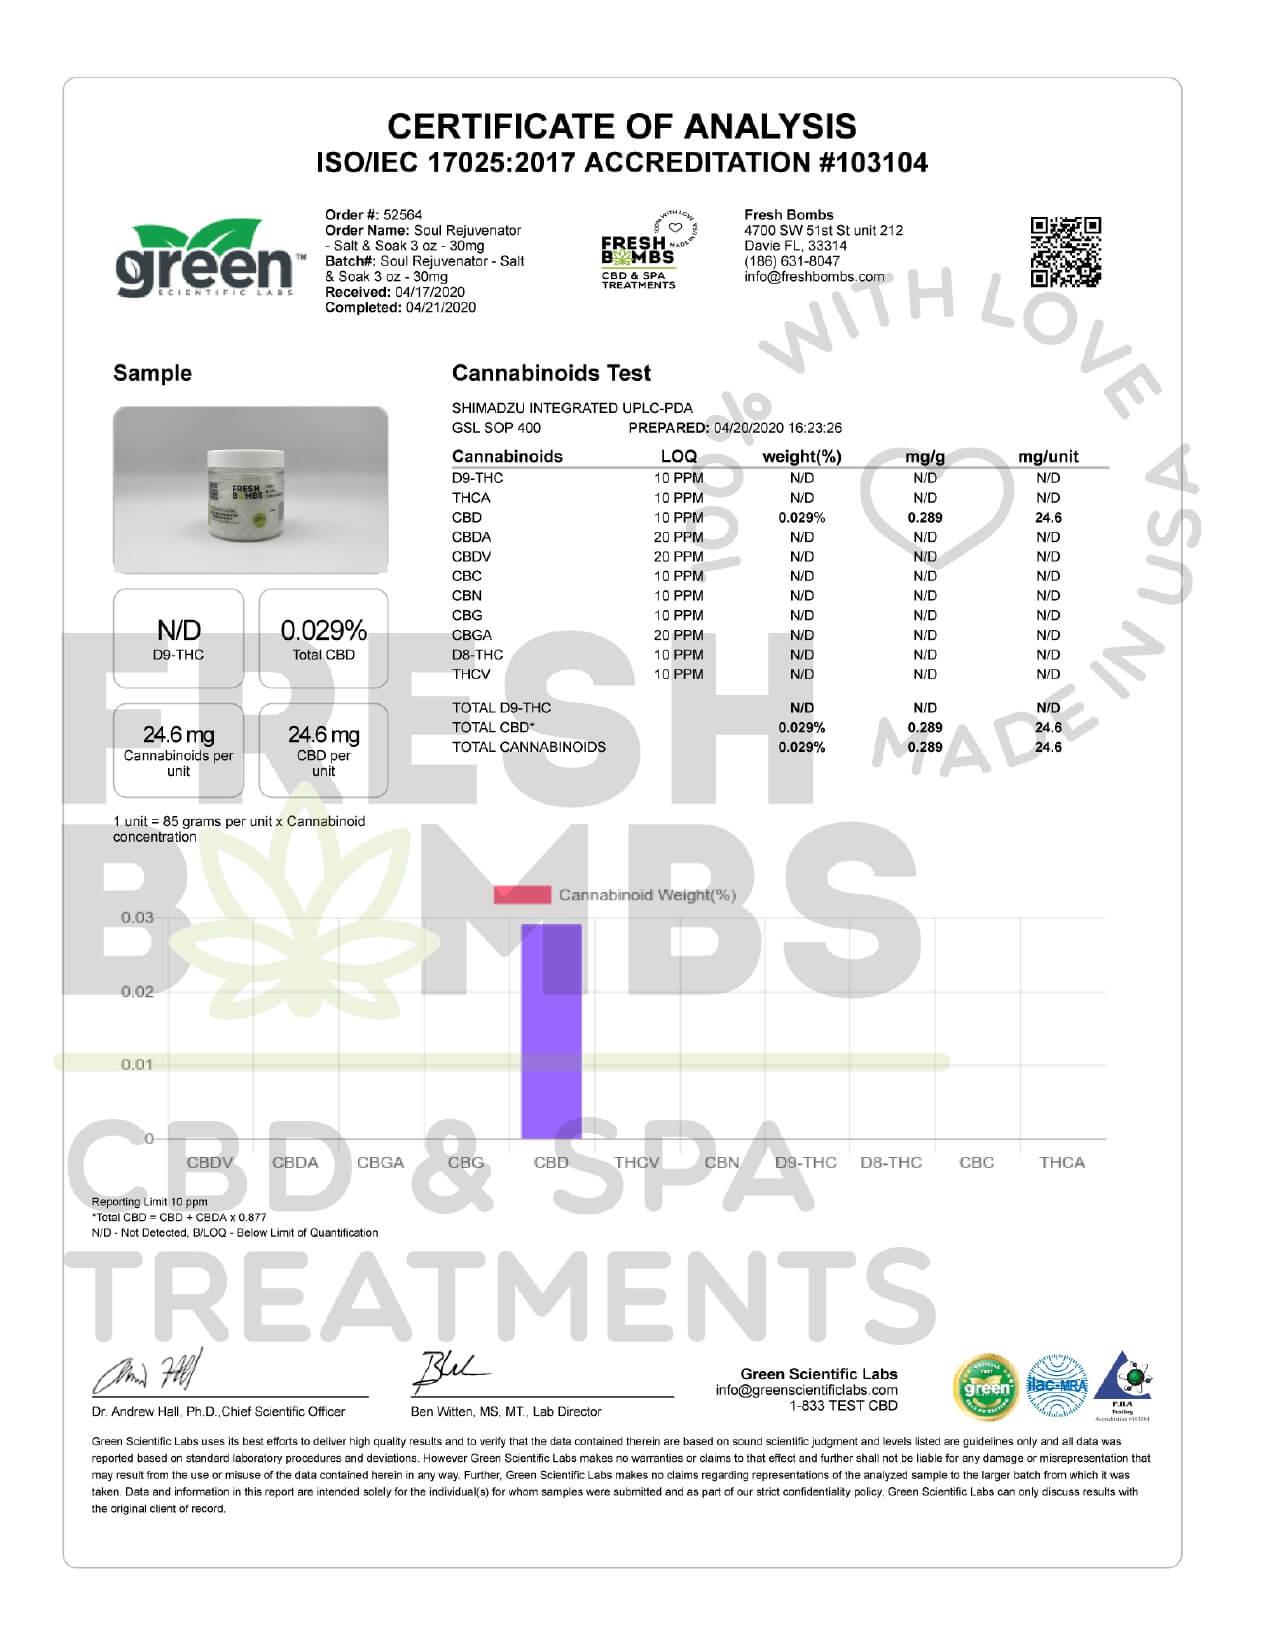 Fresh Bombs CBD Bath Soul Rejuvenator Salt Soak 30mg Lab Report